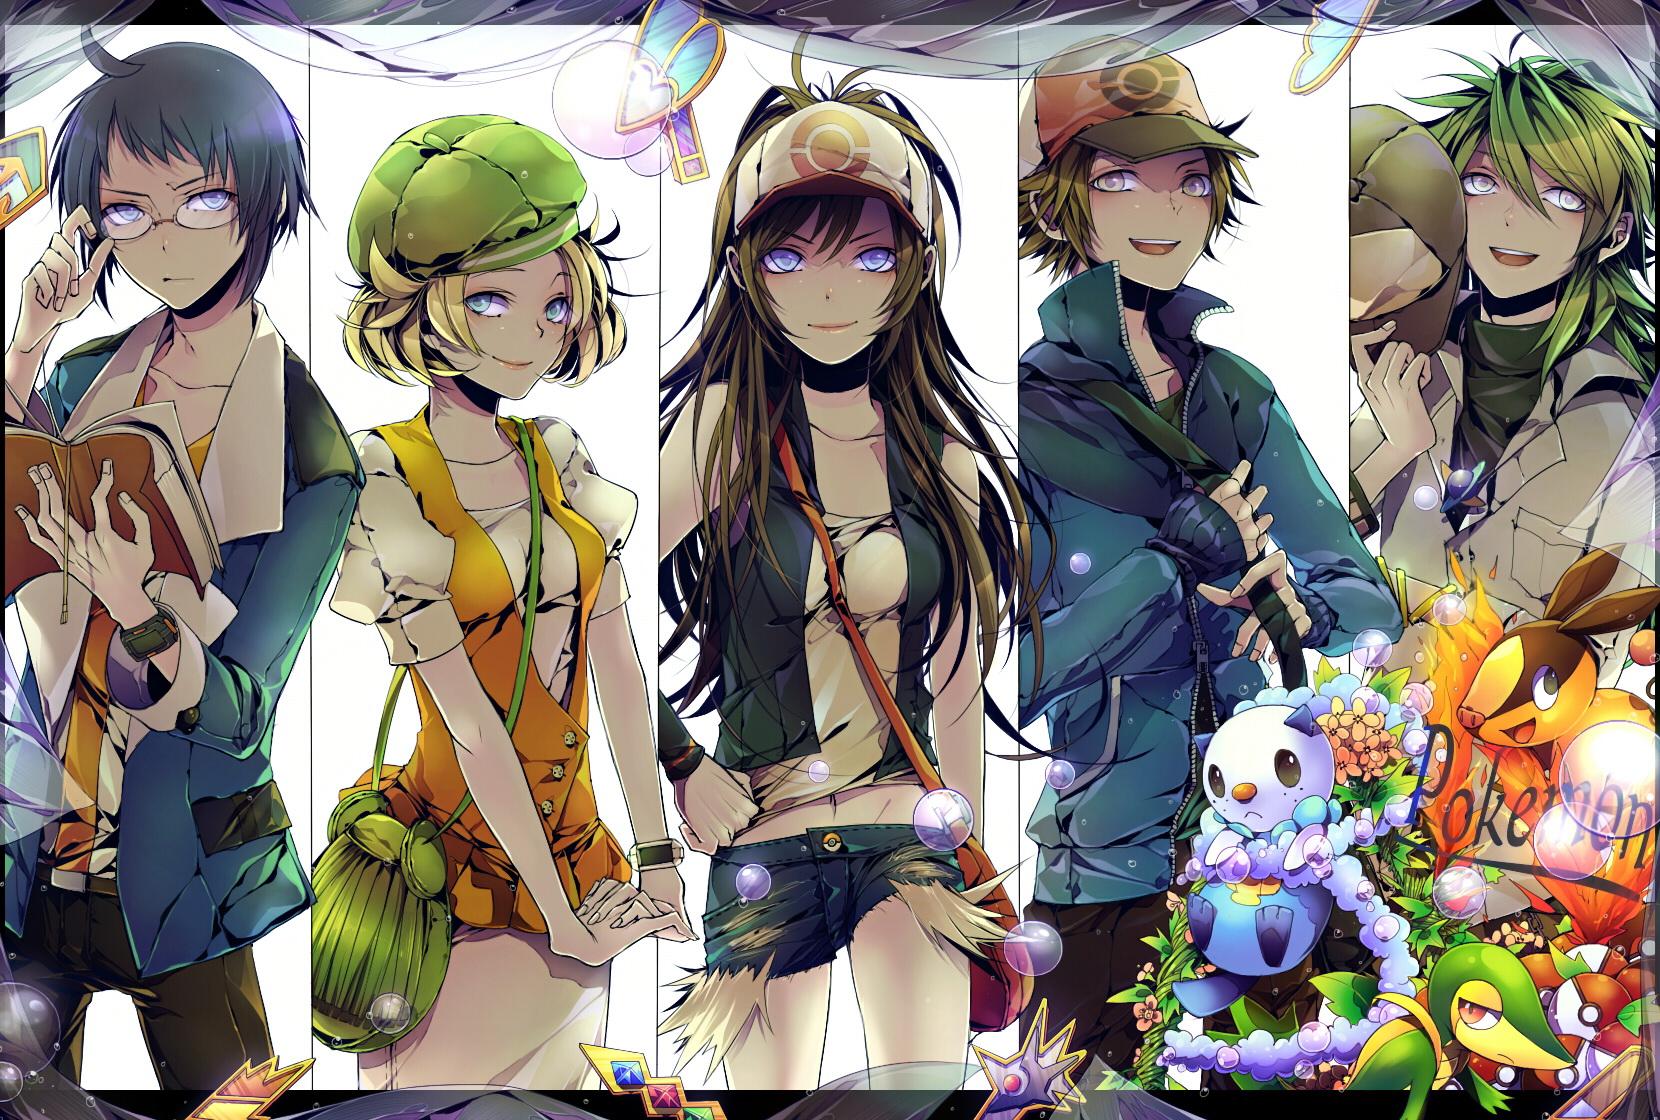 pokémon wallpaper and background | 1660x1120 | id:240149